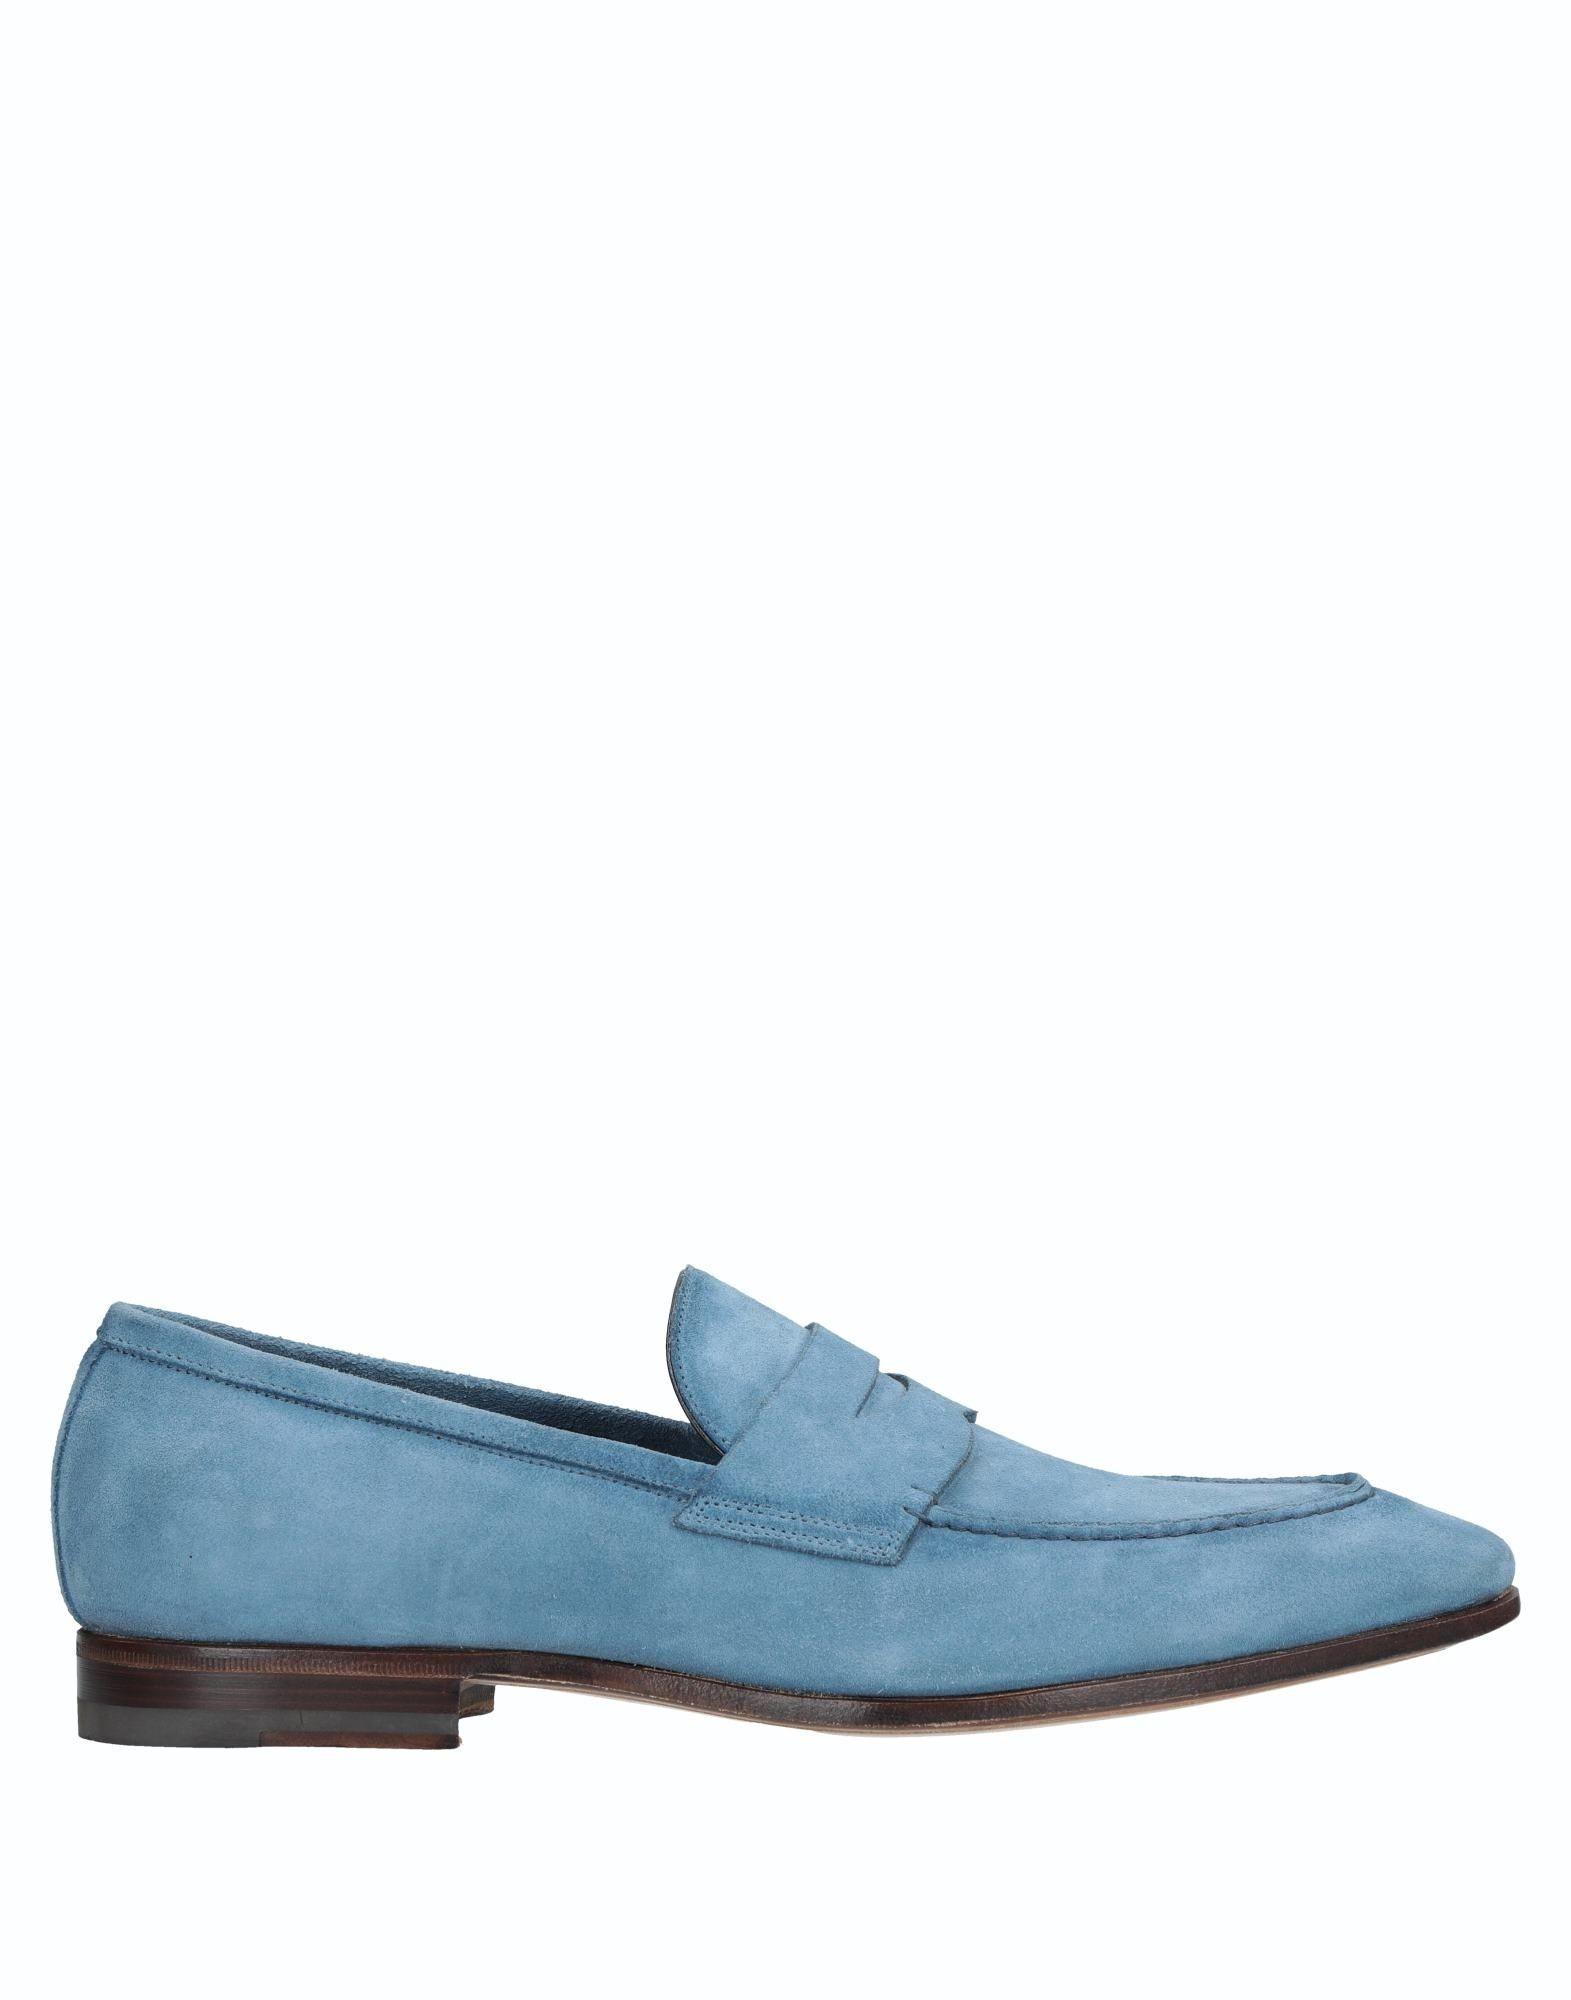 Santoni Mokassins Herren  11519822LL Gute Qualität beliebte Schuhe